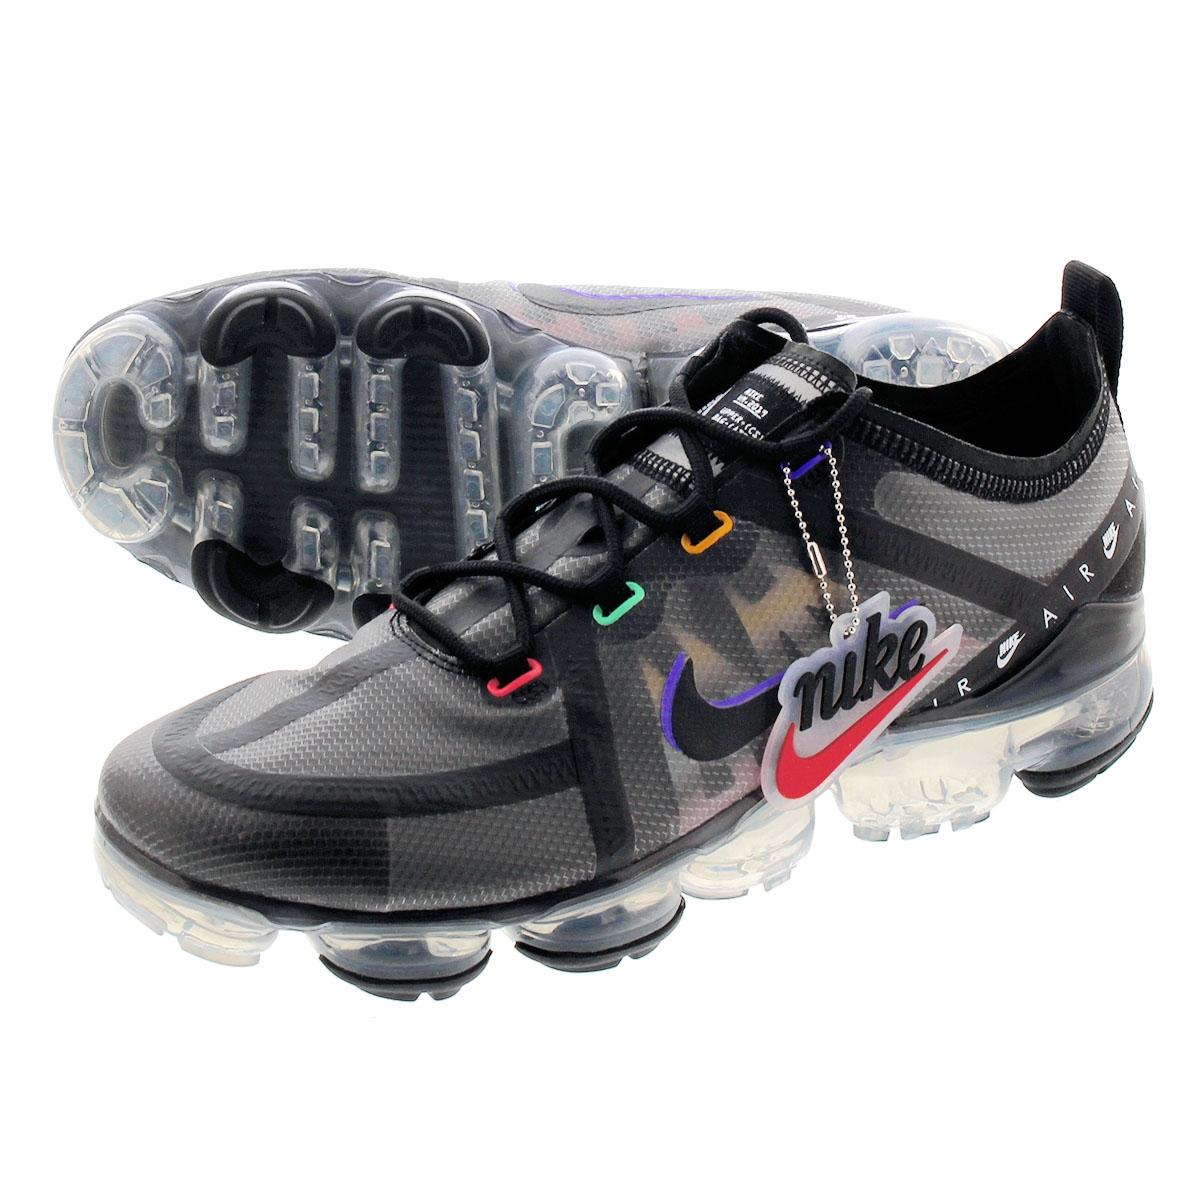 on sale 319a5 4c8ac NIKE AIR VAPORMAX 2019 SE Nike air vapor max 2019 SE BLACK/BLACK/PSYCHIC  PURPLE ci1240-023